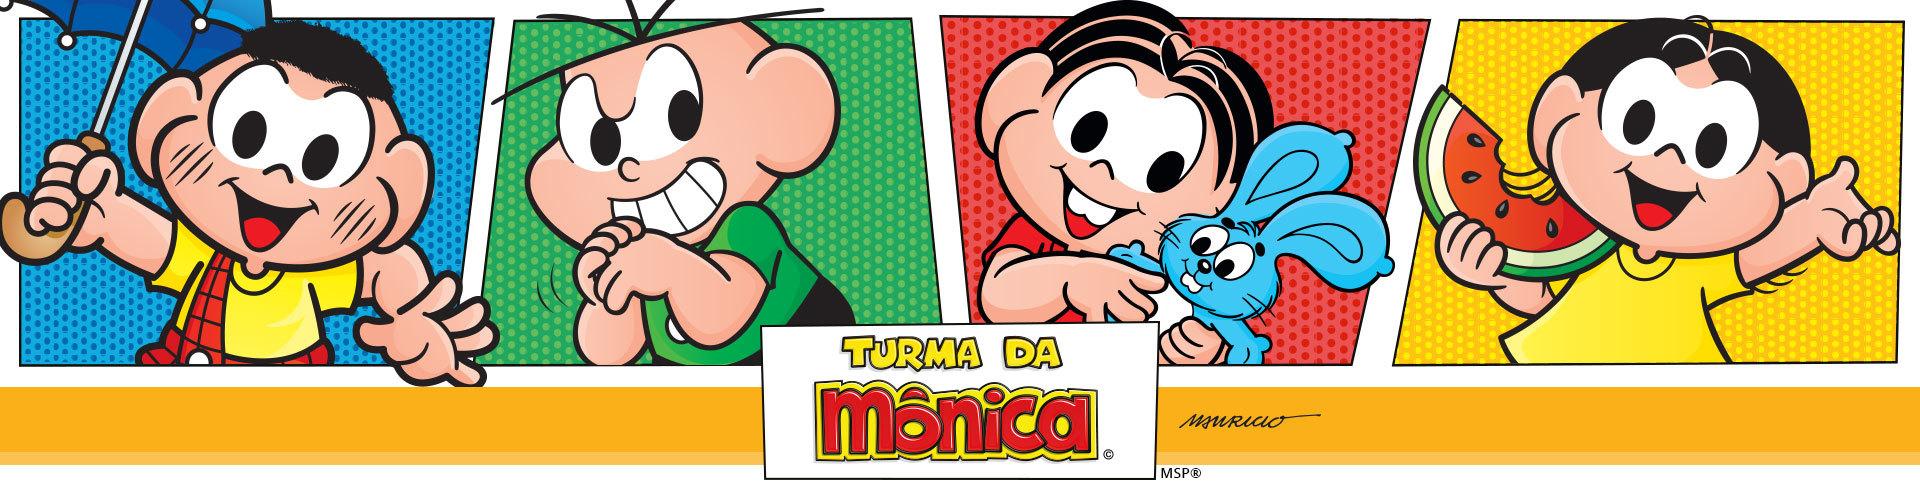 Banner Turma da Mônica